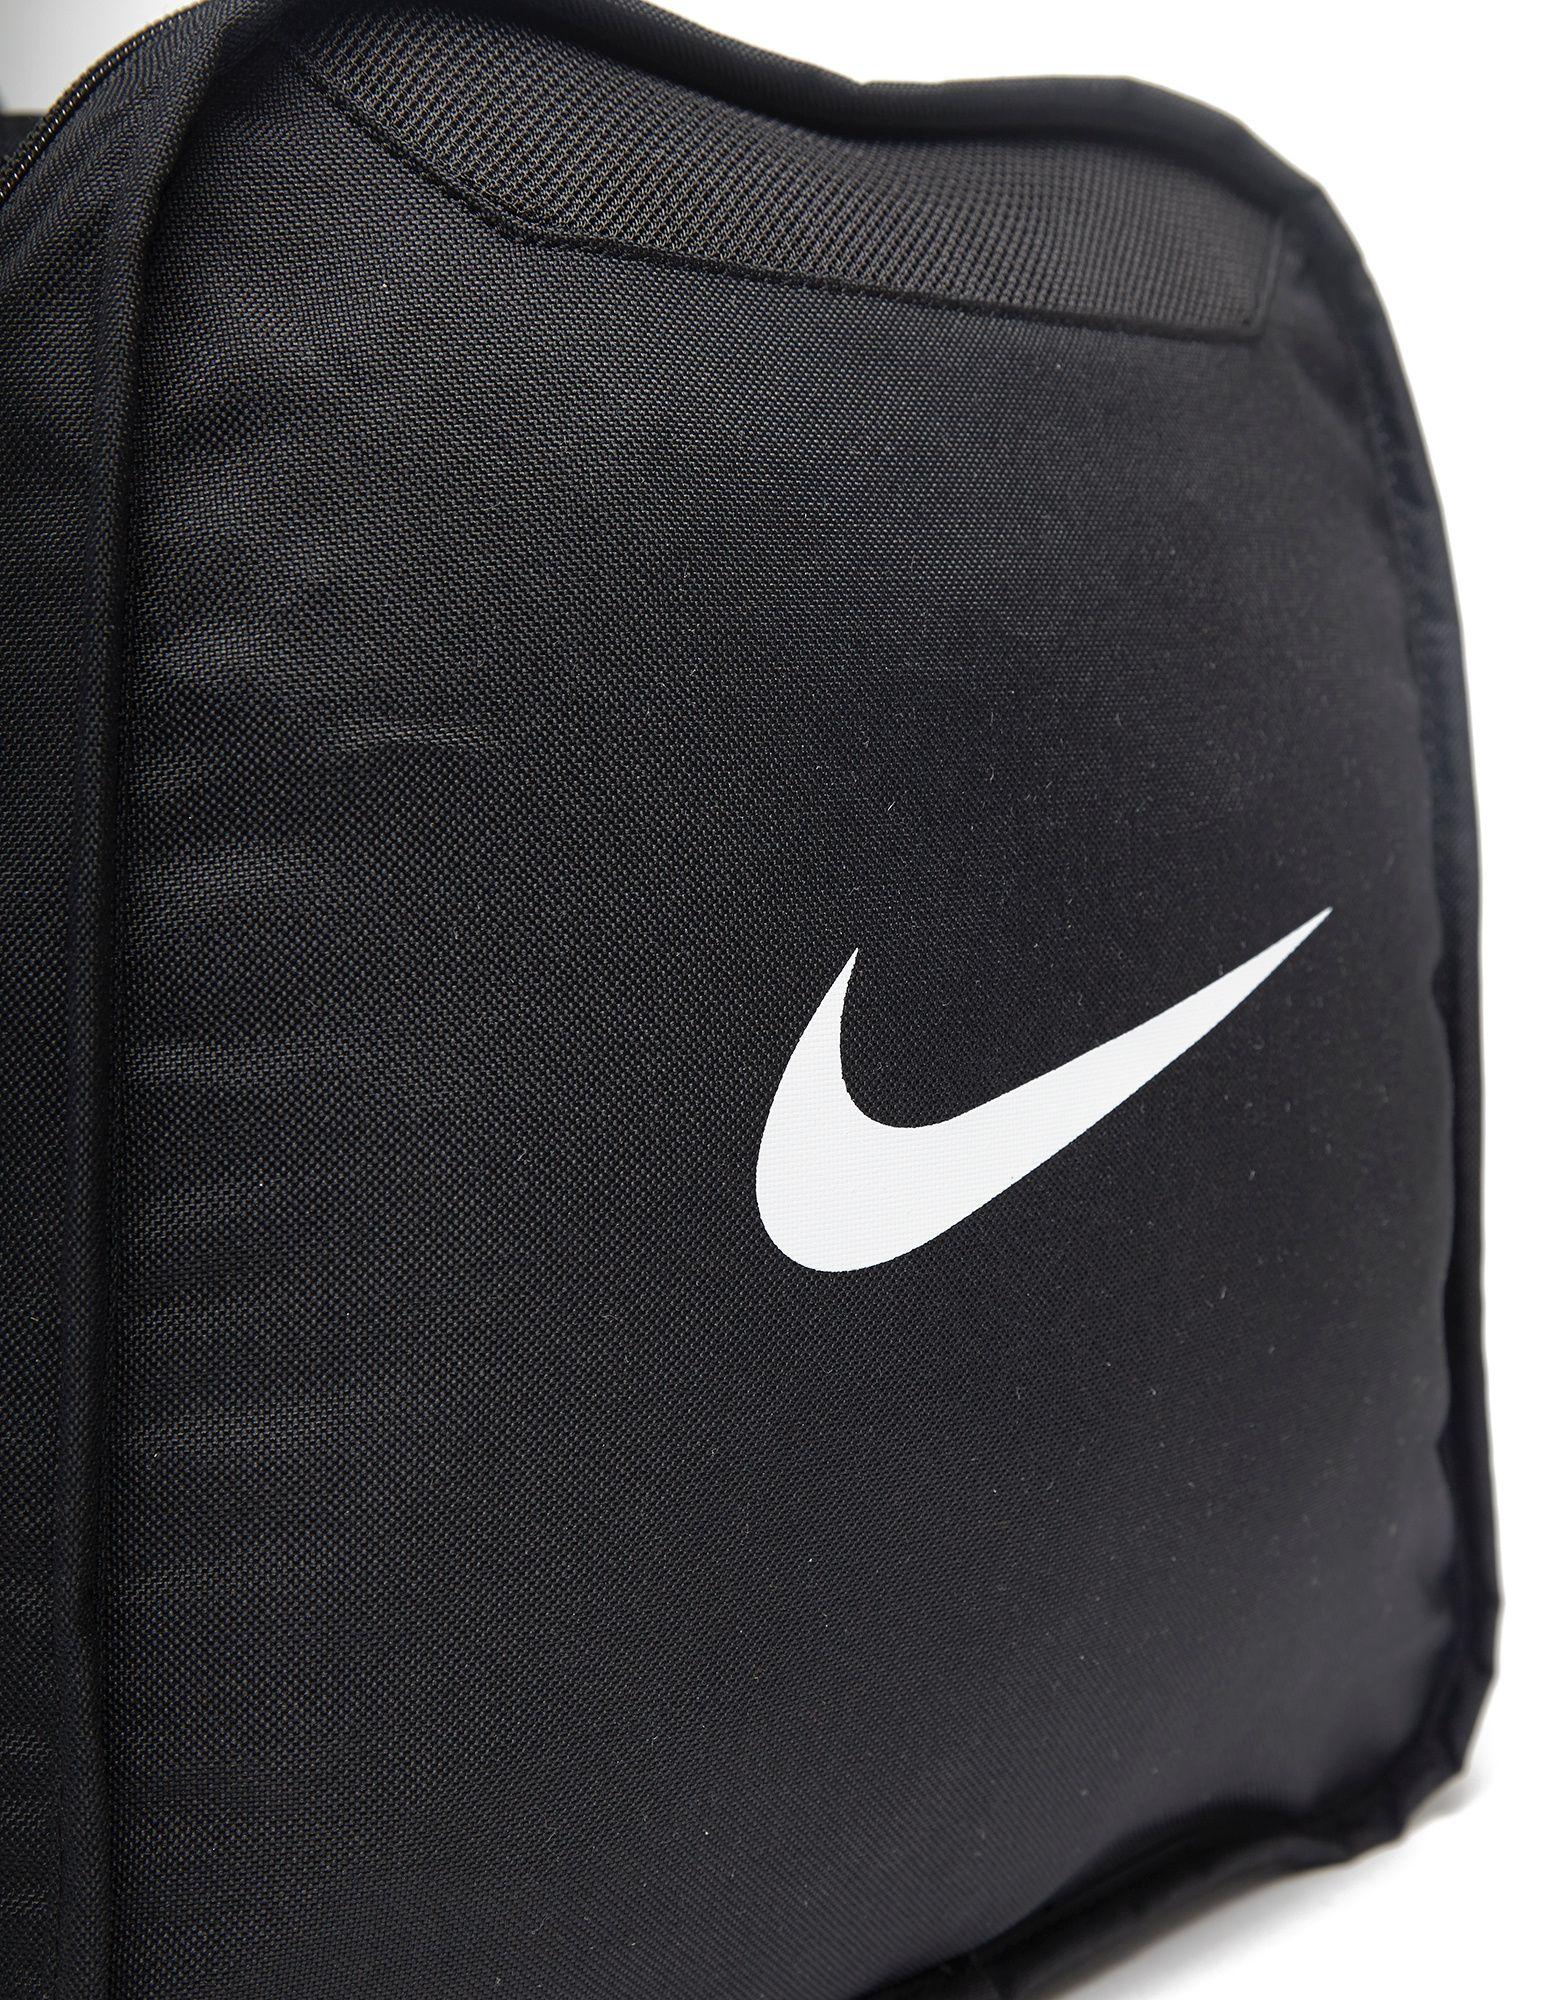 Nike Large Duffle Bag